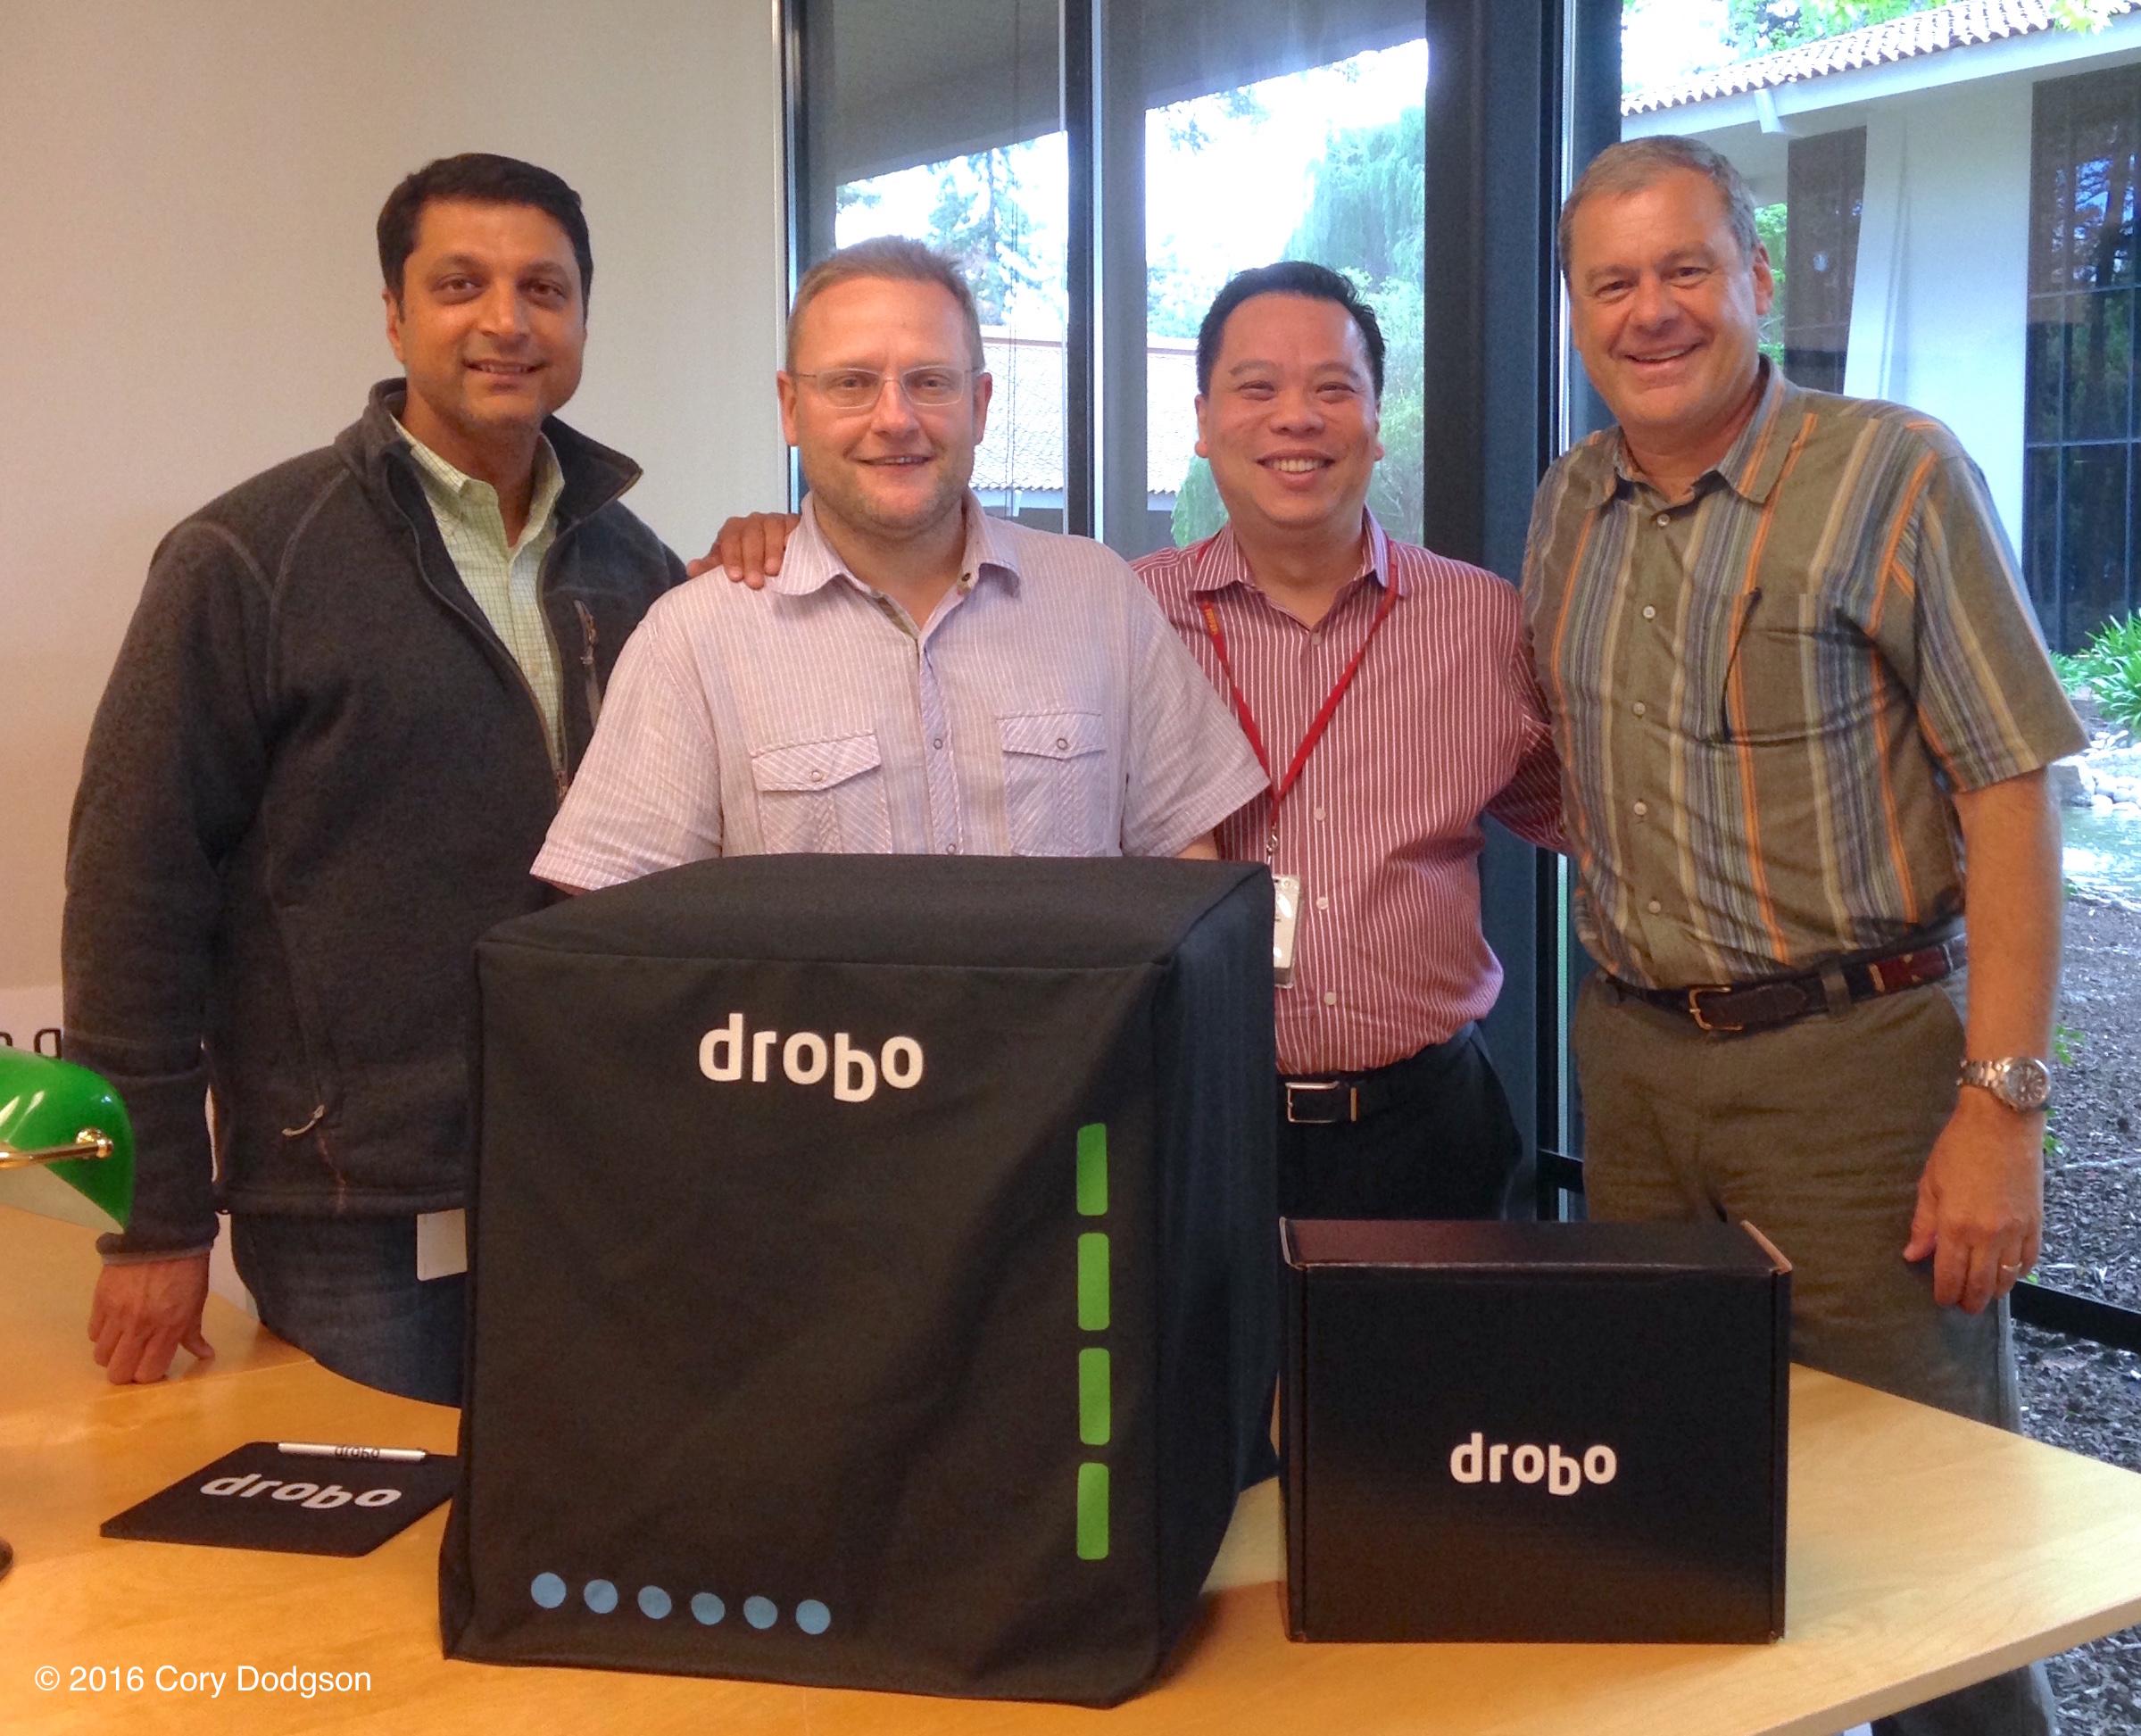 Drobo Ceo Mihir Shaw, CTo Rod Harrison, VP of Sales Tom Wong and Daniel Cox at Drobo headquarters in San Jose, Ca.